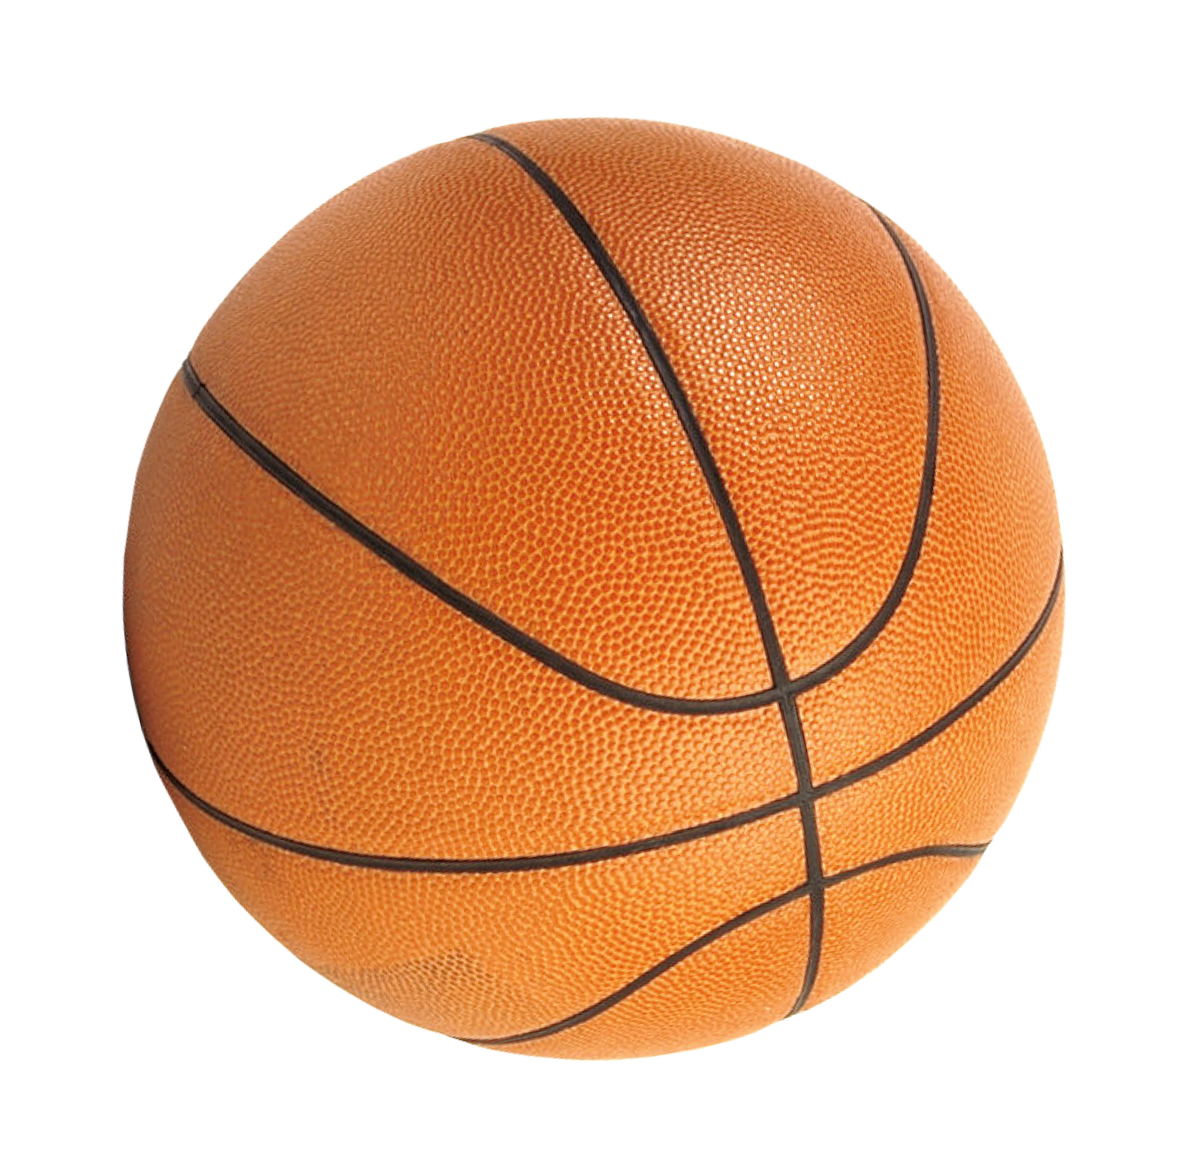 Basketball video clipart vector library library Basketball - 15773 - TransparentPNG vector library library